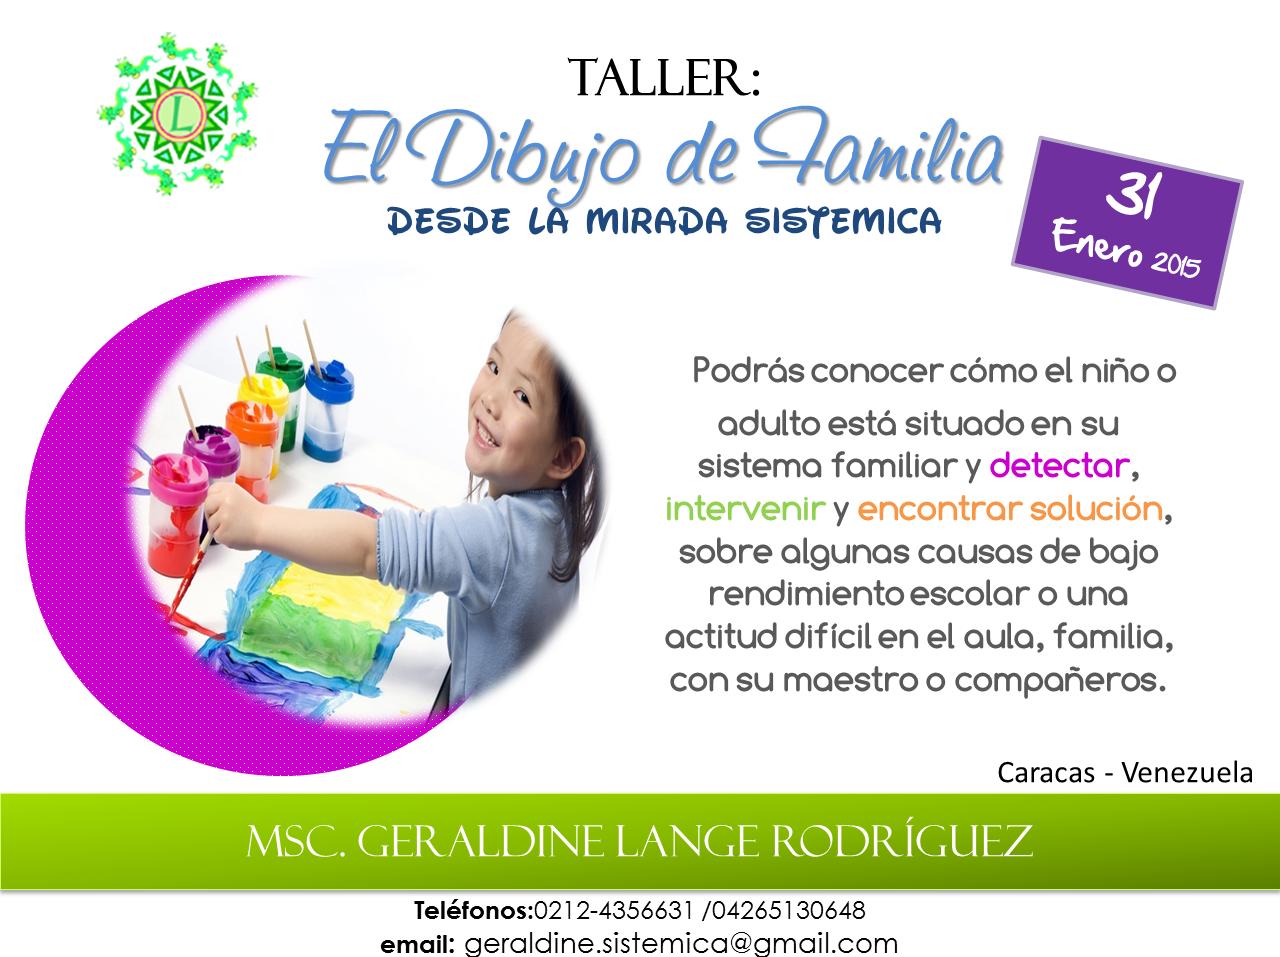 Worksheet. Taller El Dibujo de Familia Herramienta Psico  Educativa Desde